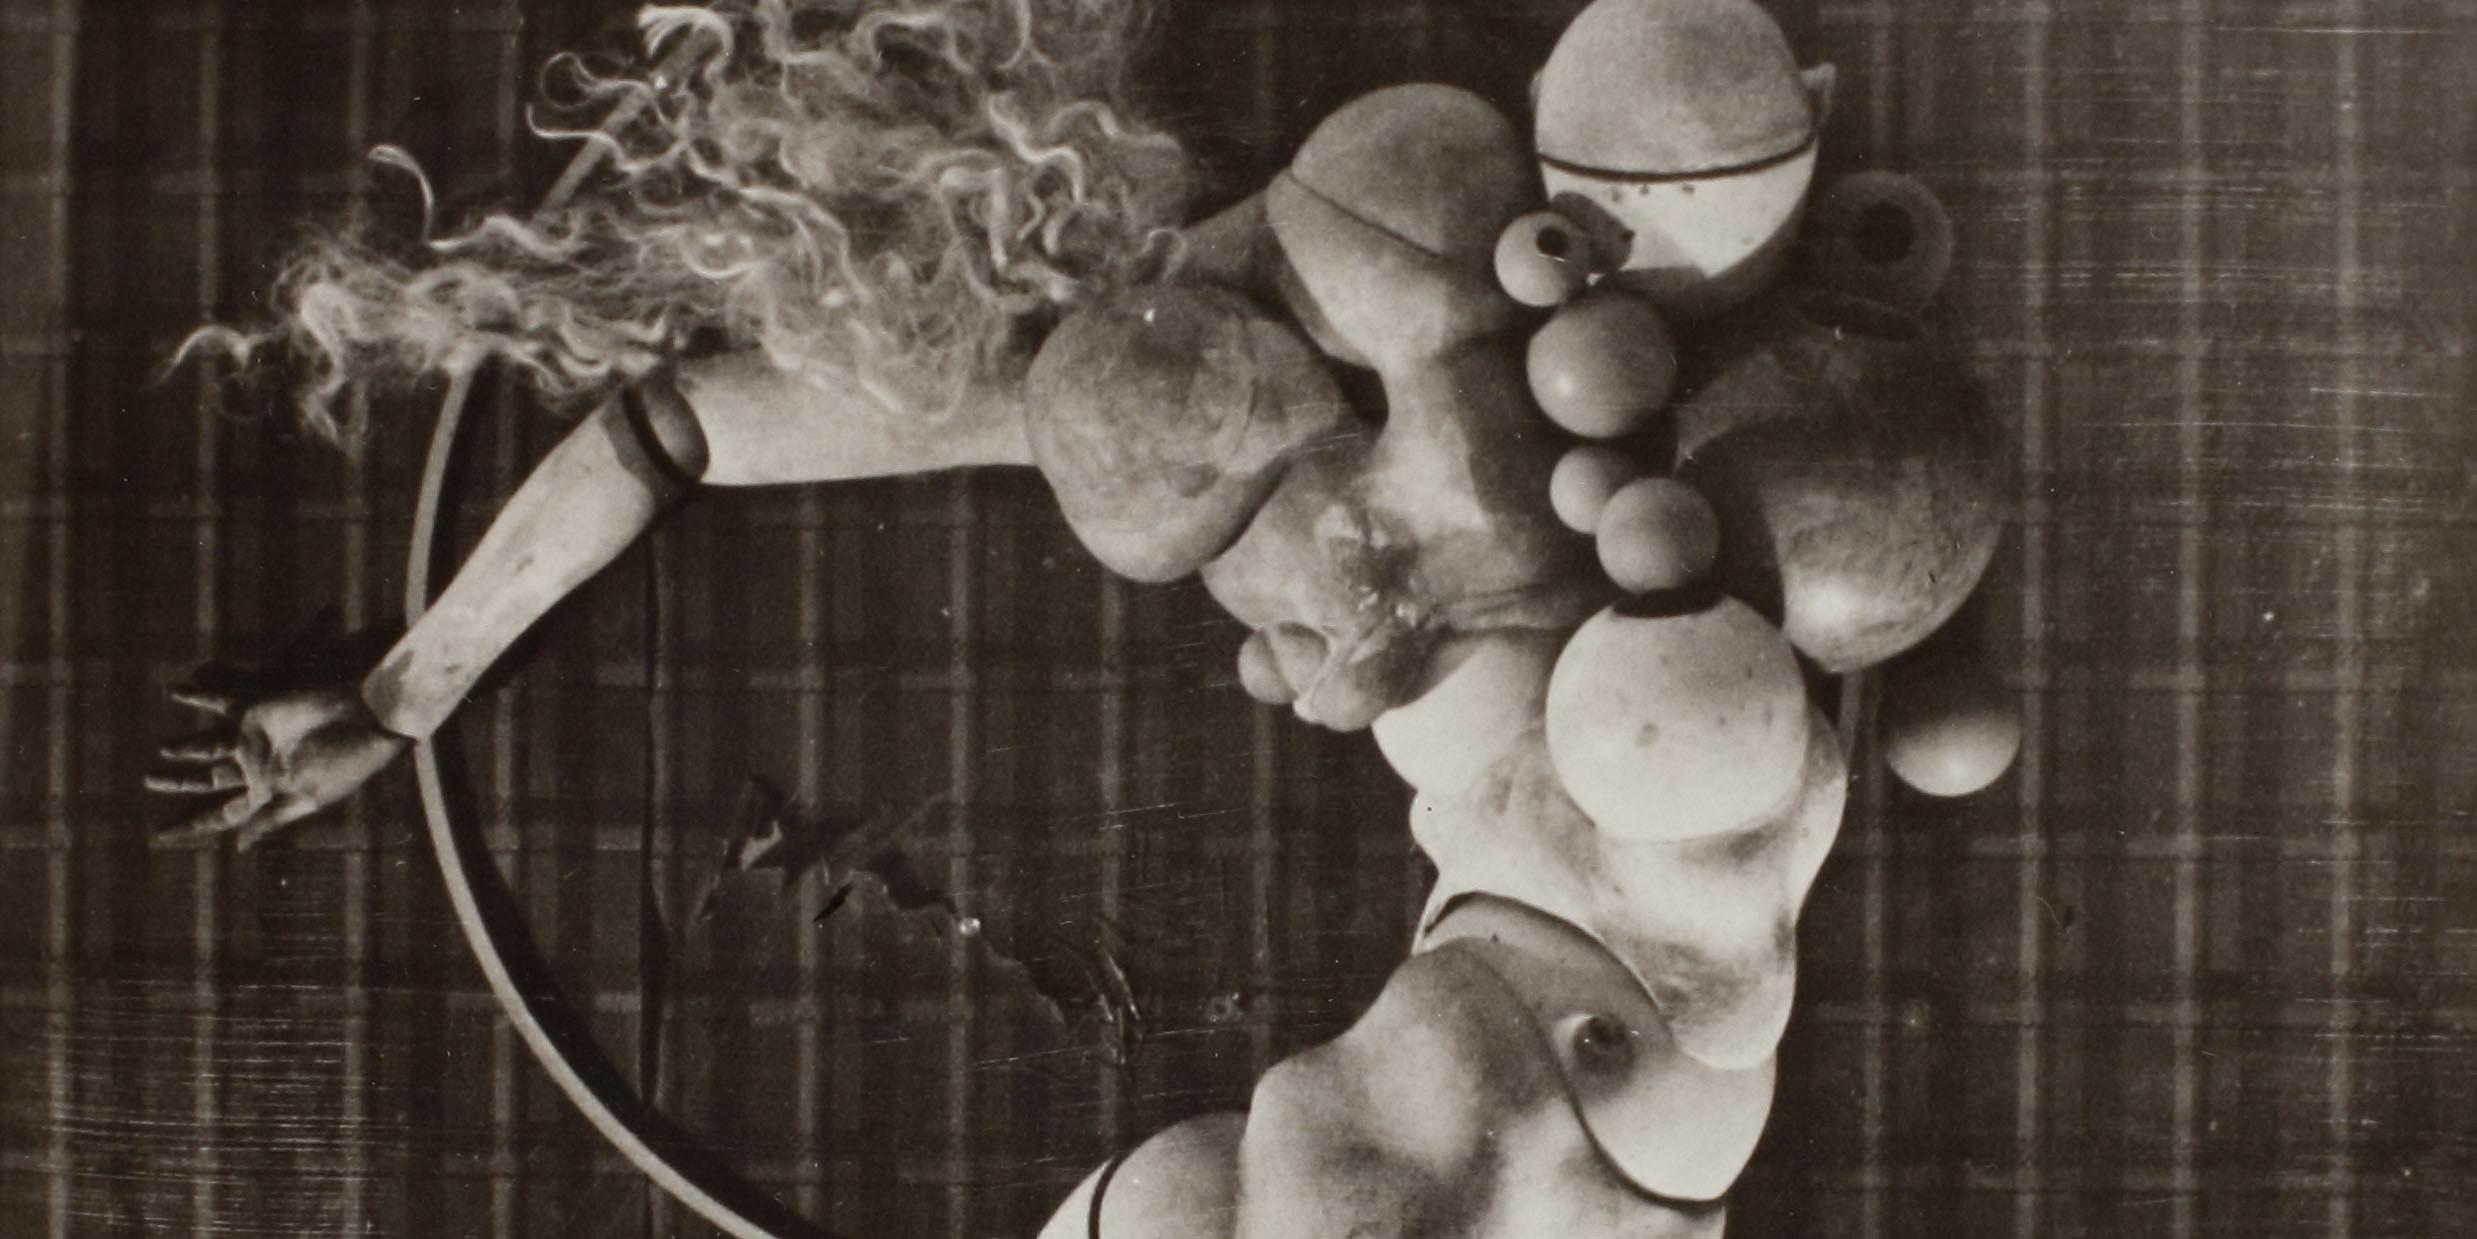 Hans Bellmer: Photographs & Drawings